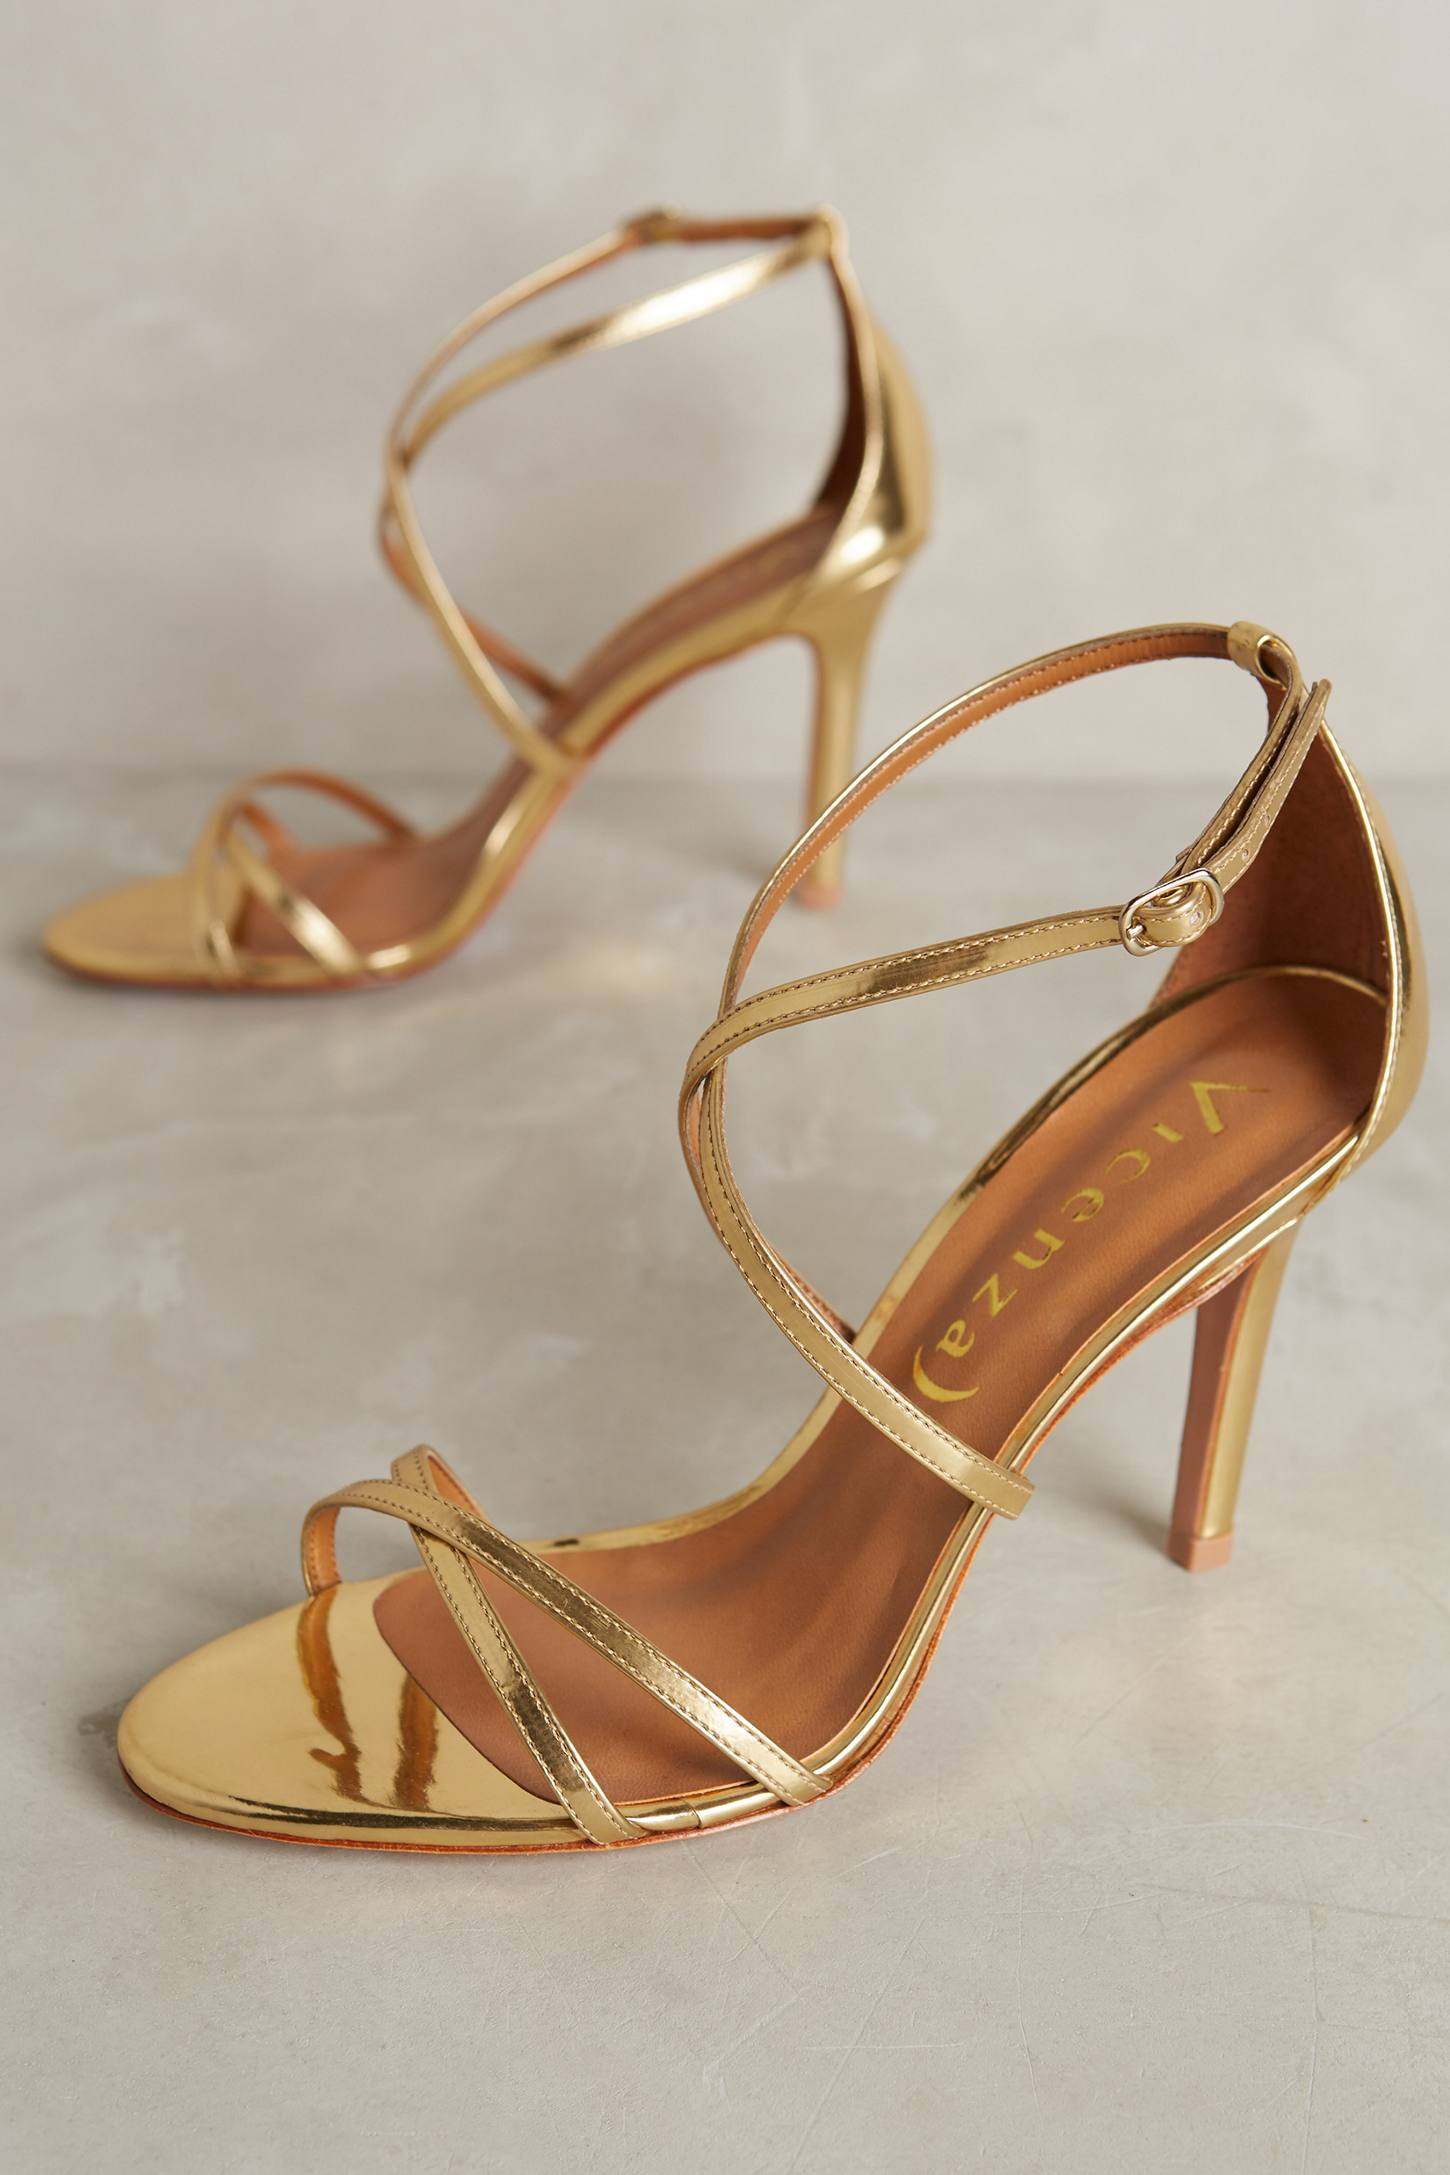 Vicenza Cross-Strap Heels